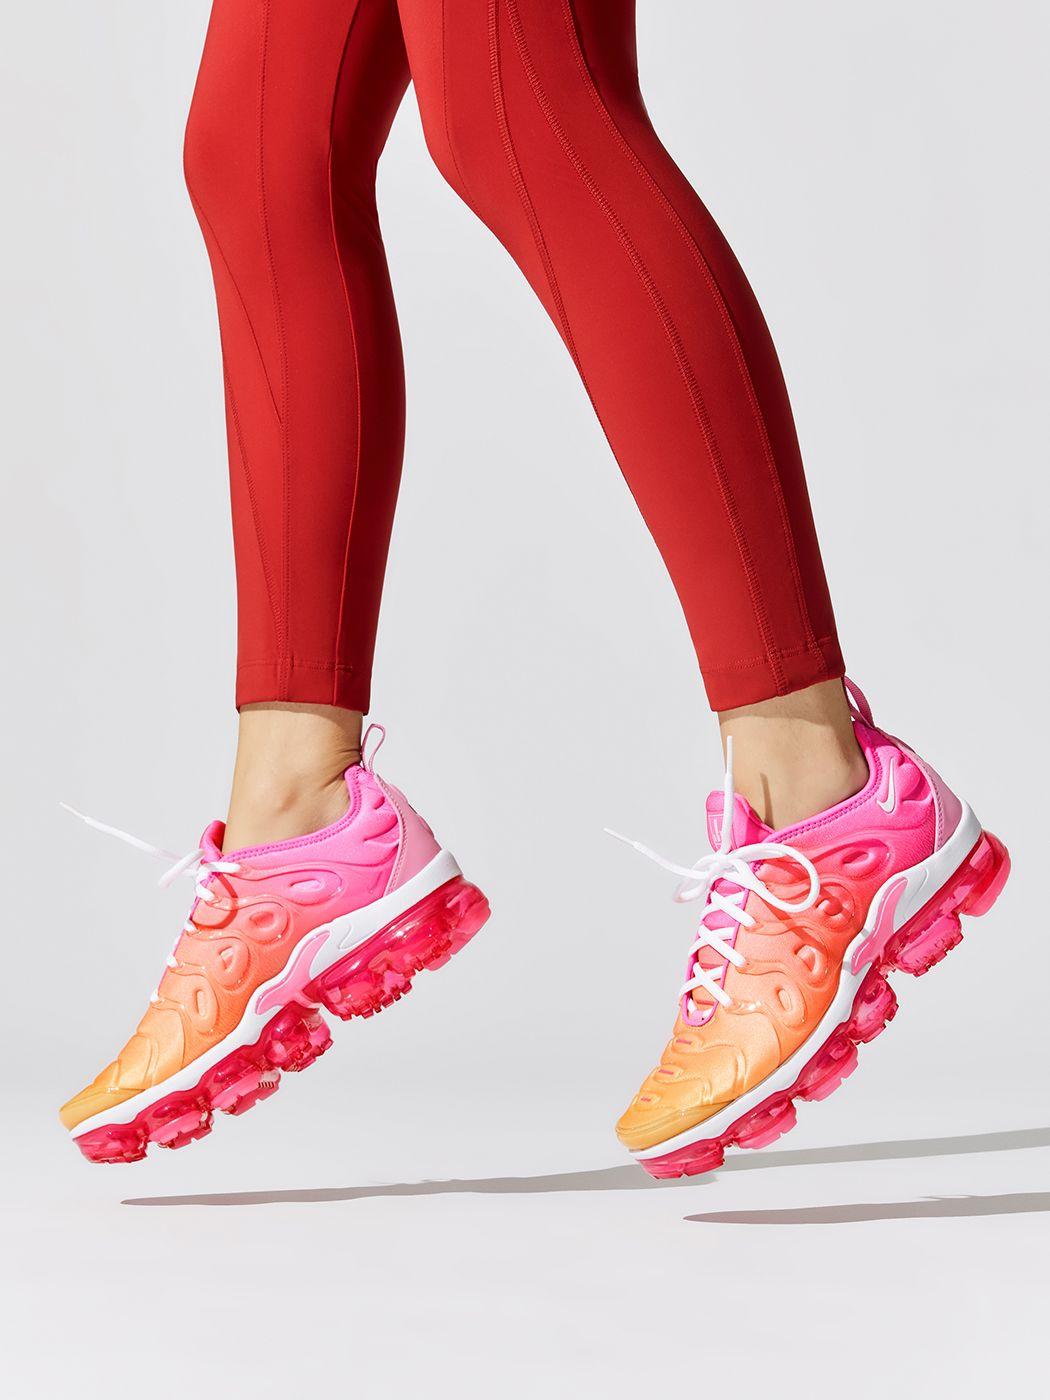 nike air vapormax plus women's pink